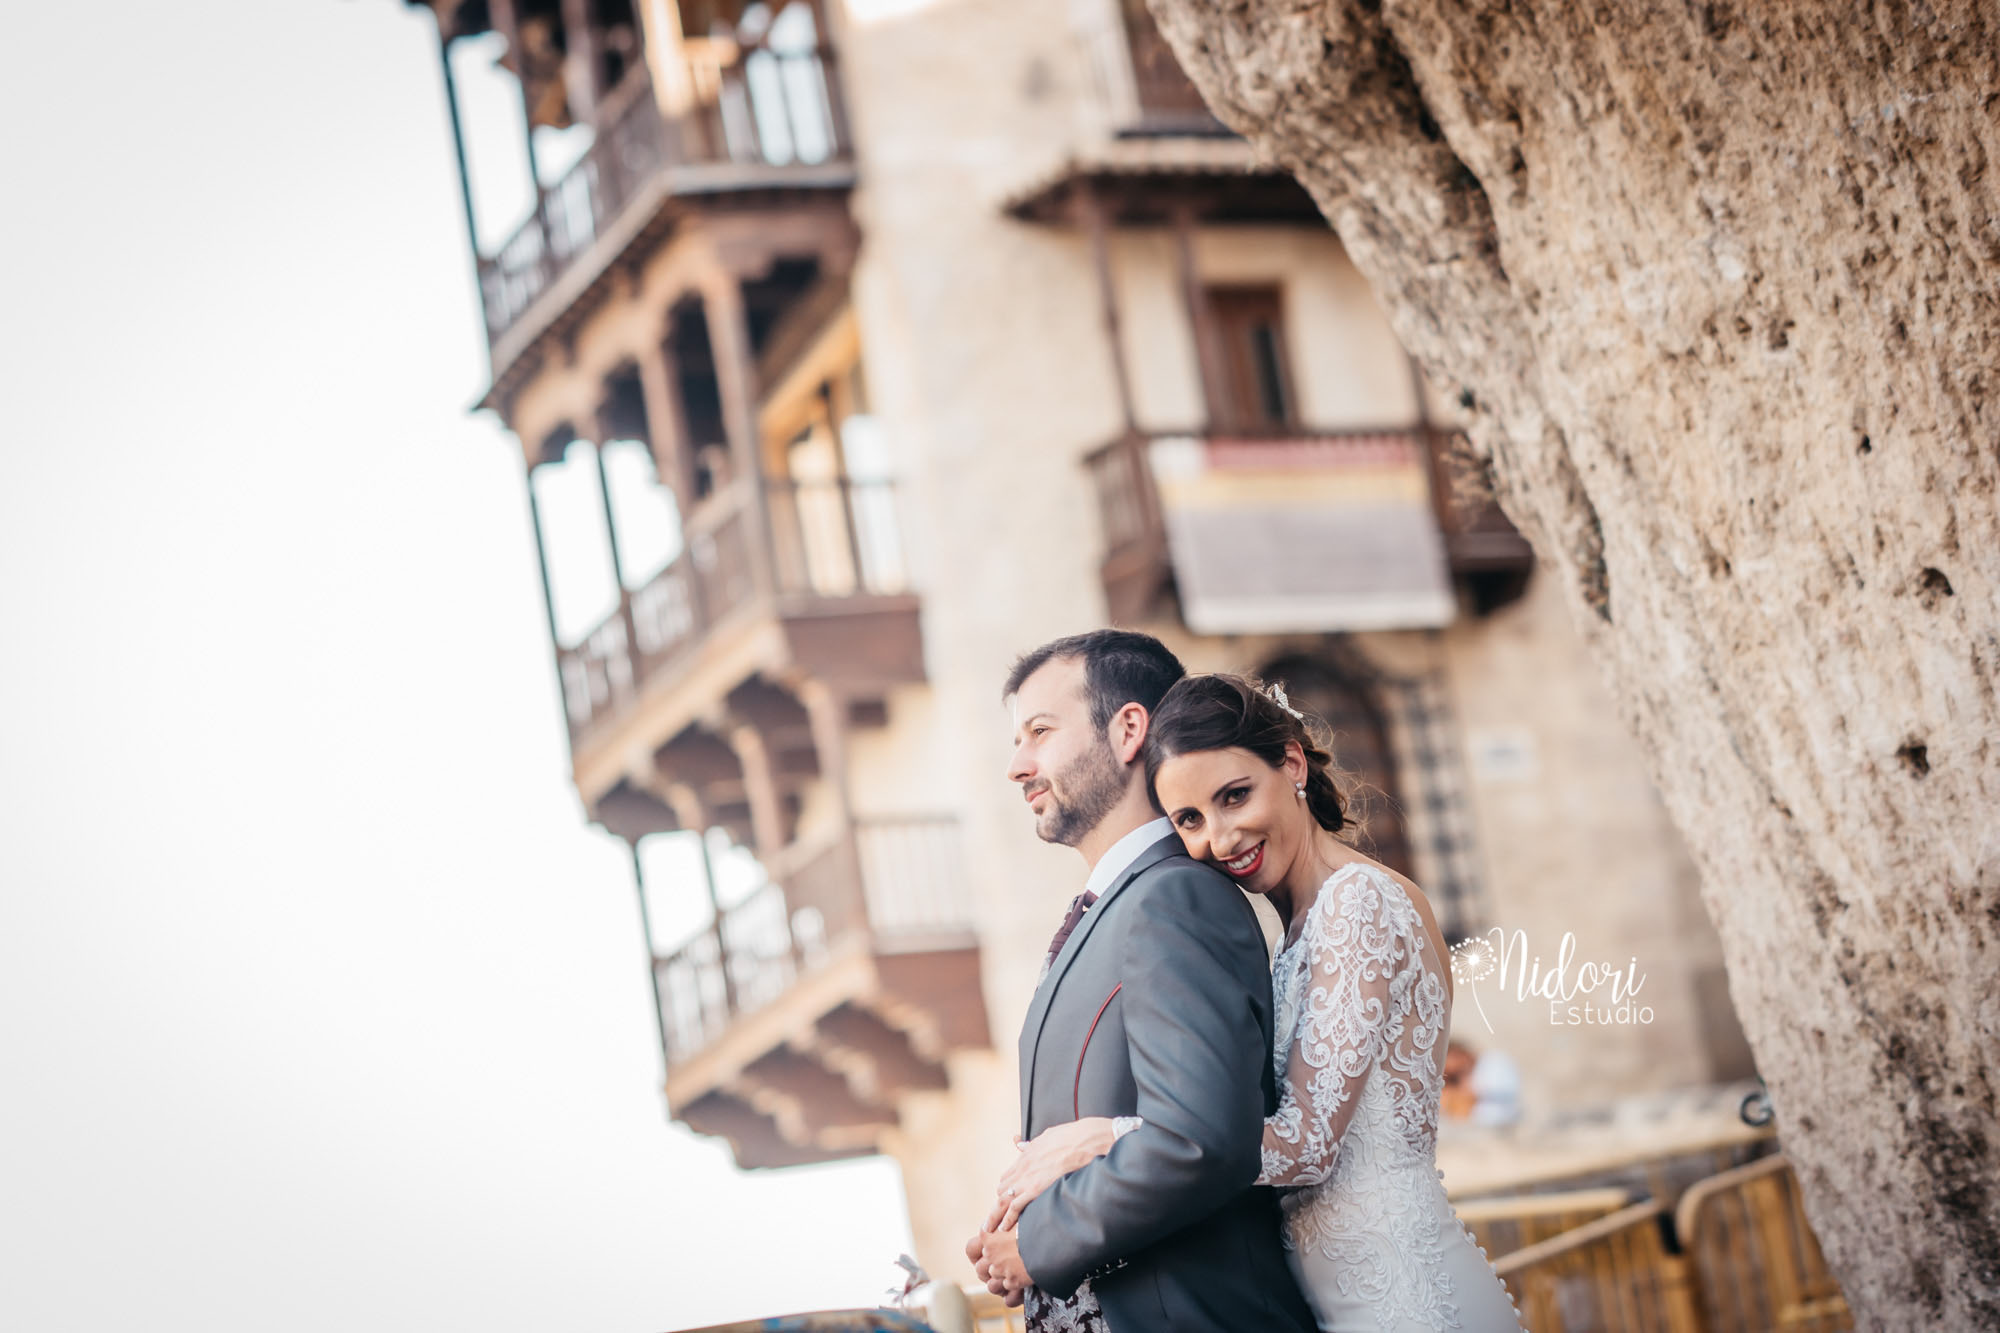 fotos-de-boda-reportaje-novios-fotografia-boda-nidoriestudio-fotos-valencia-almazora-castellon-españa-spain-068